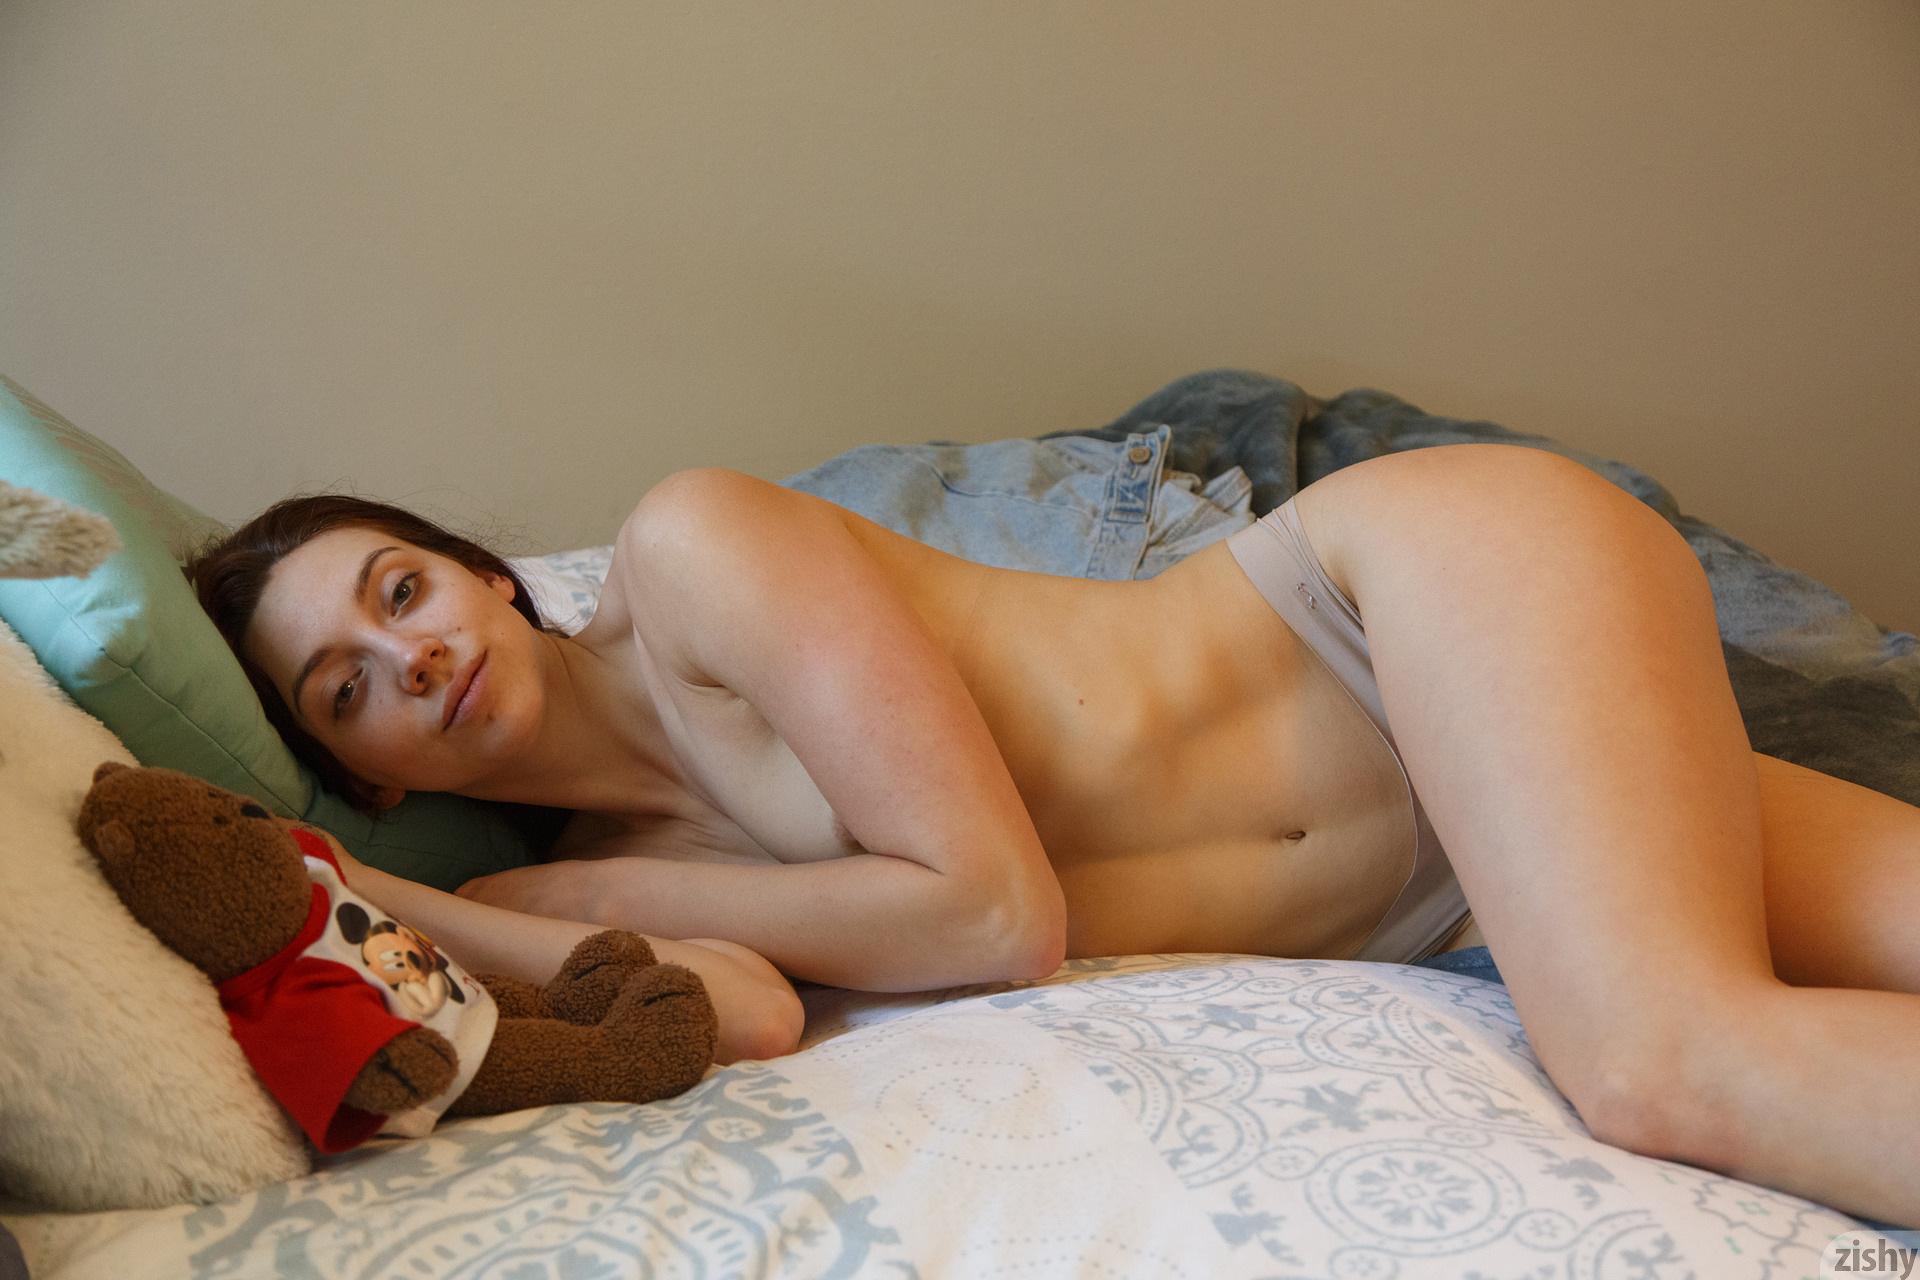 Ivah Anseline Hard But Soft Zishy (26)